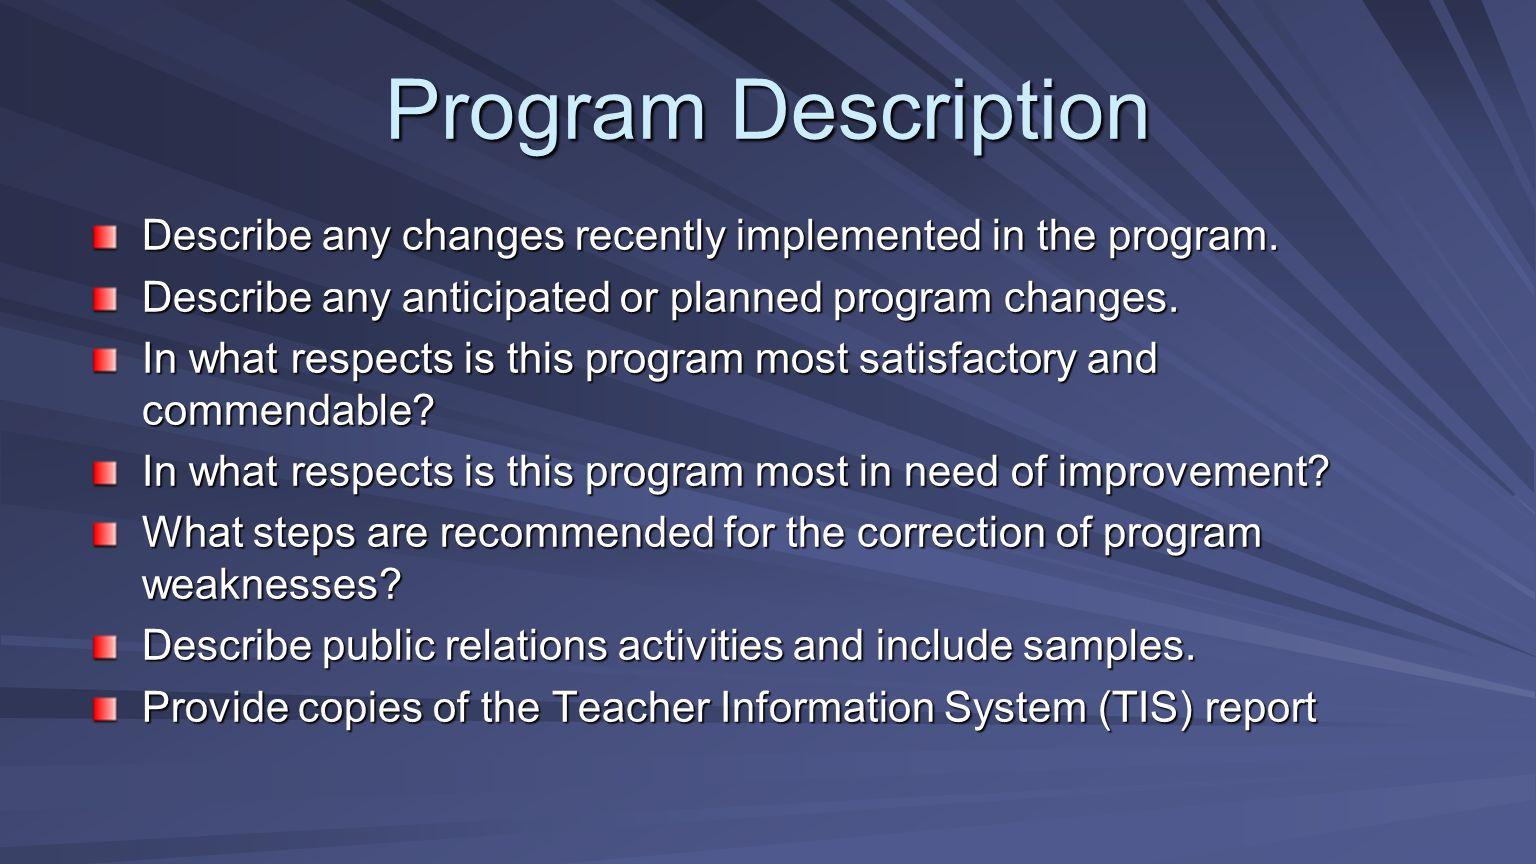 Program Description Describe any changes recently implemented in the program. Describe any anticipated or planned program changes.